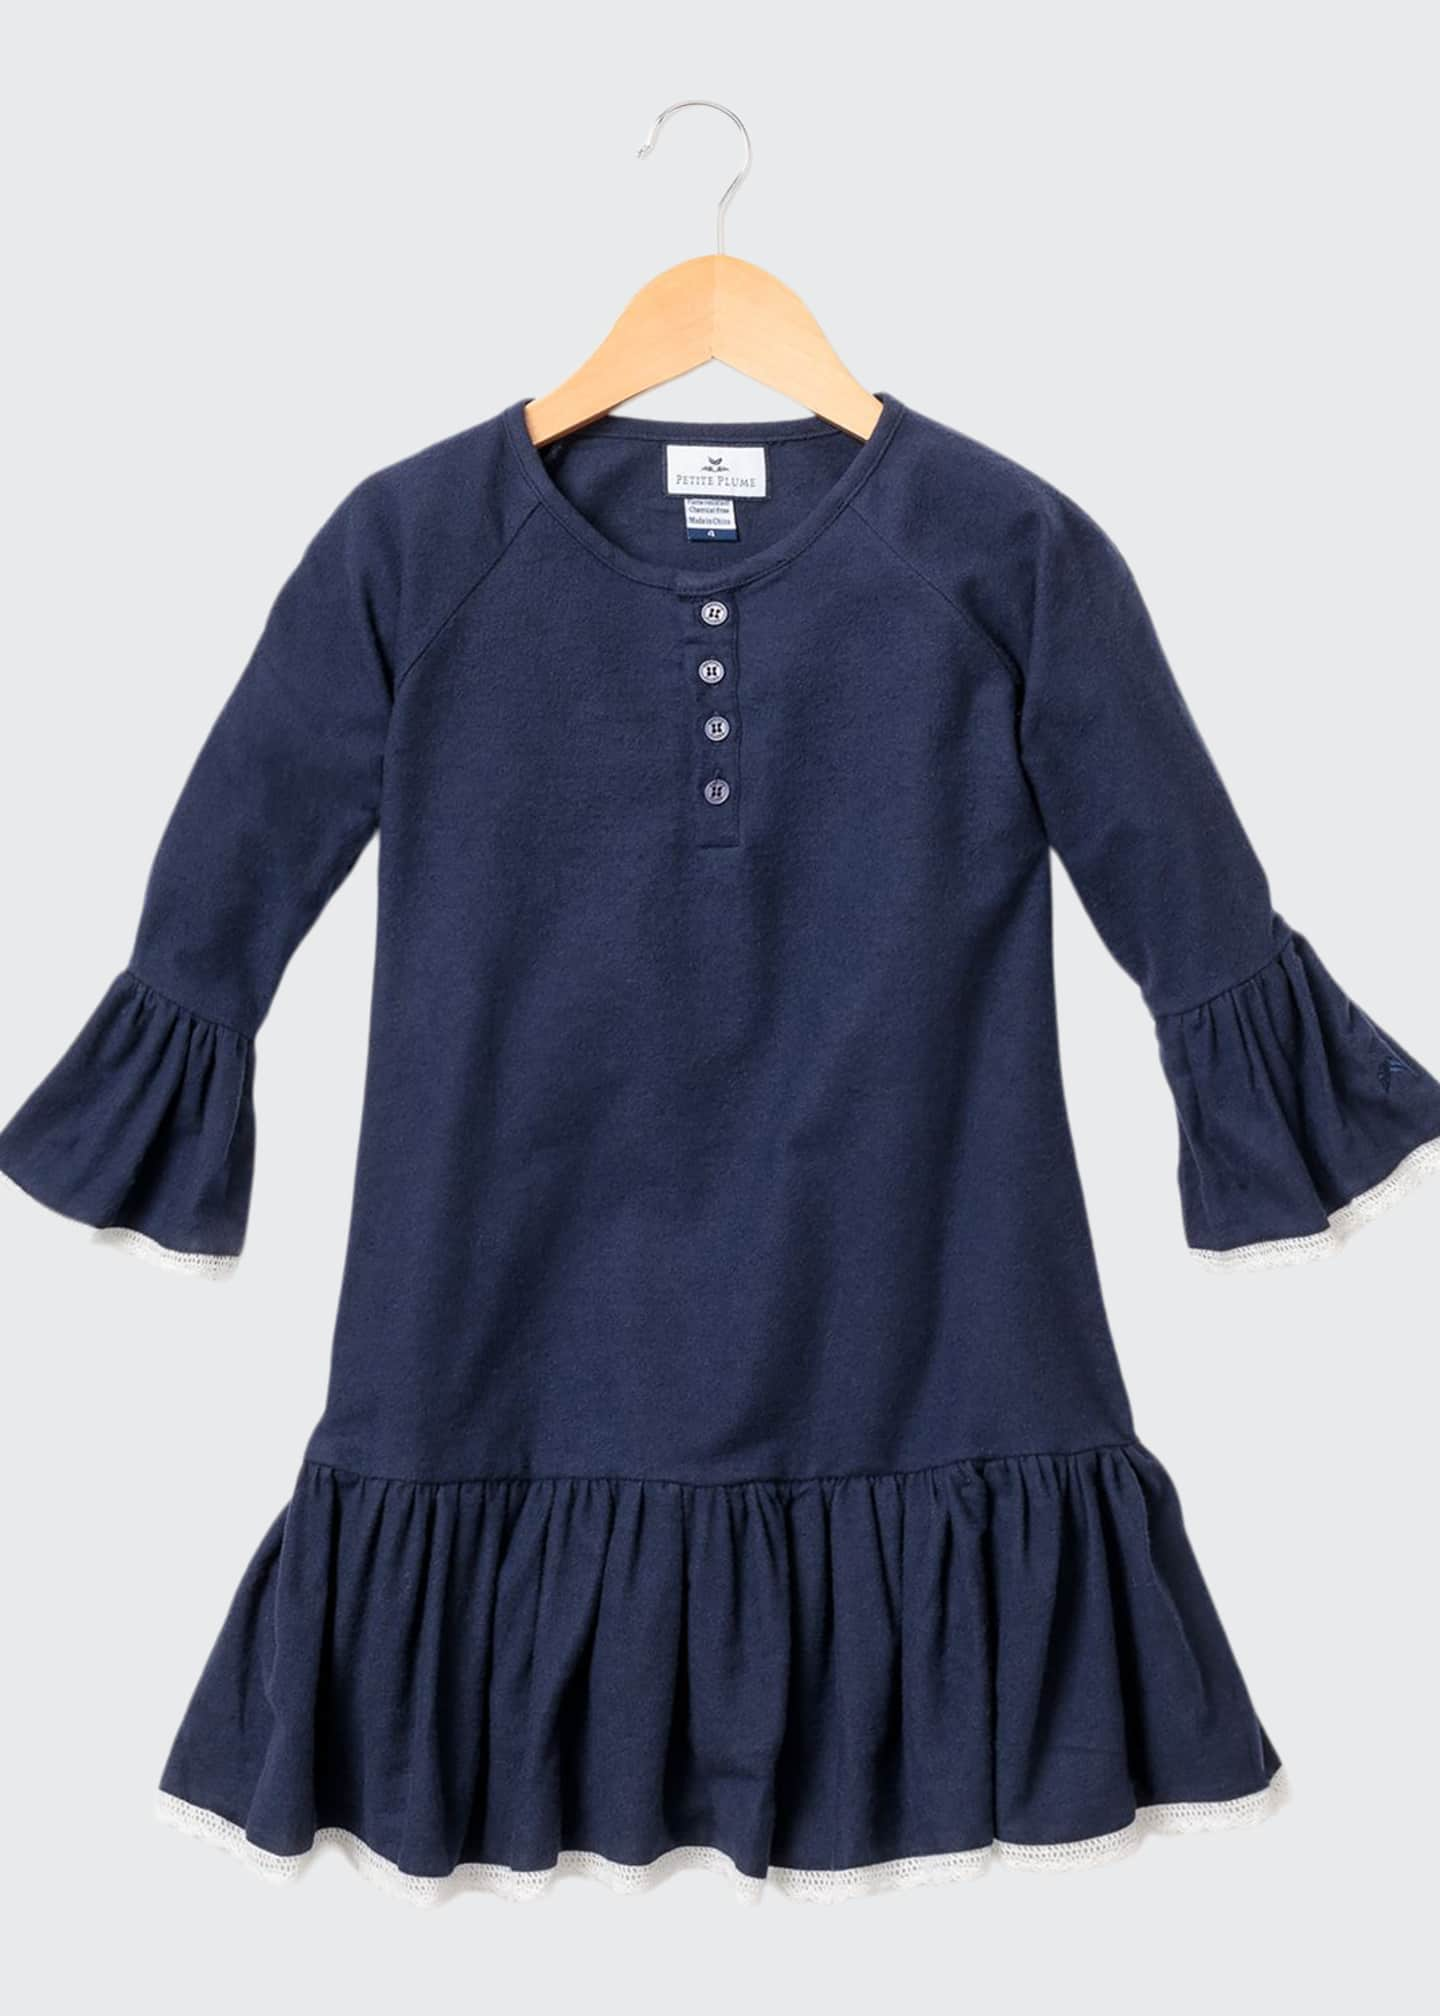 Petite Plume Arabella Lace-Trim Nightgown, Size 6M-14